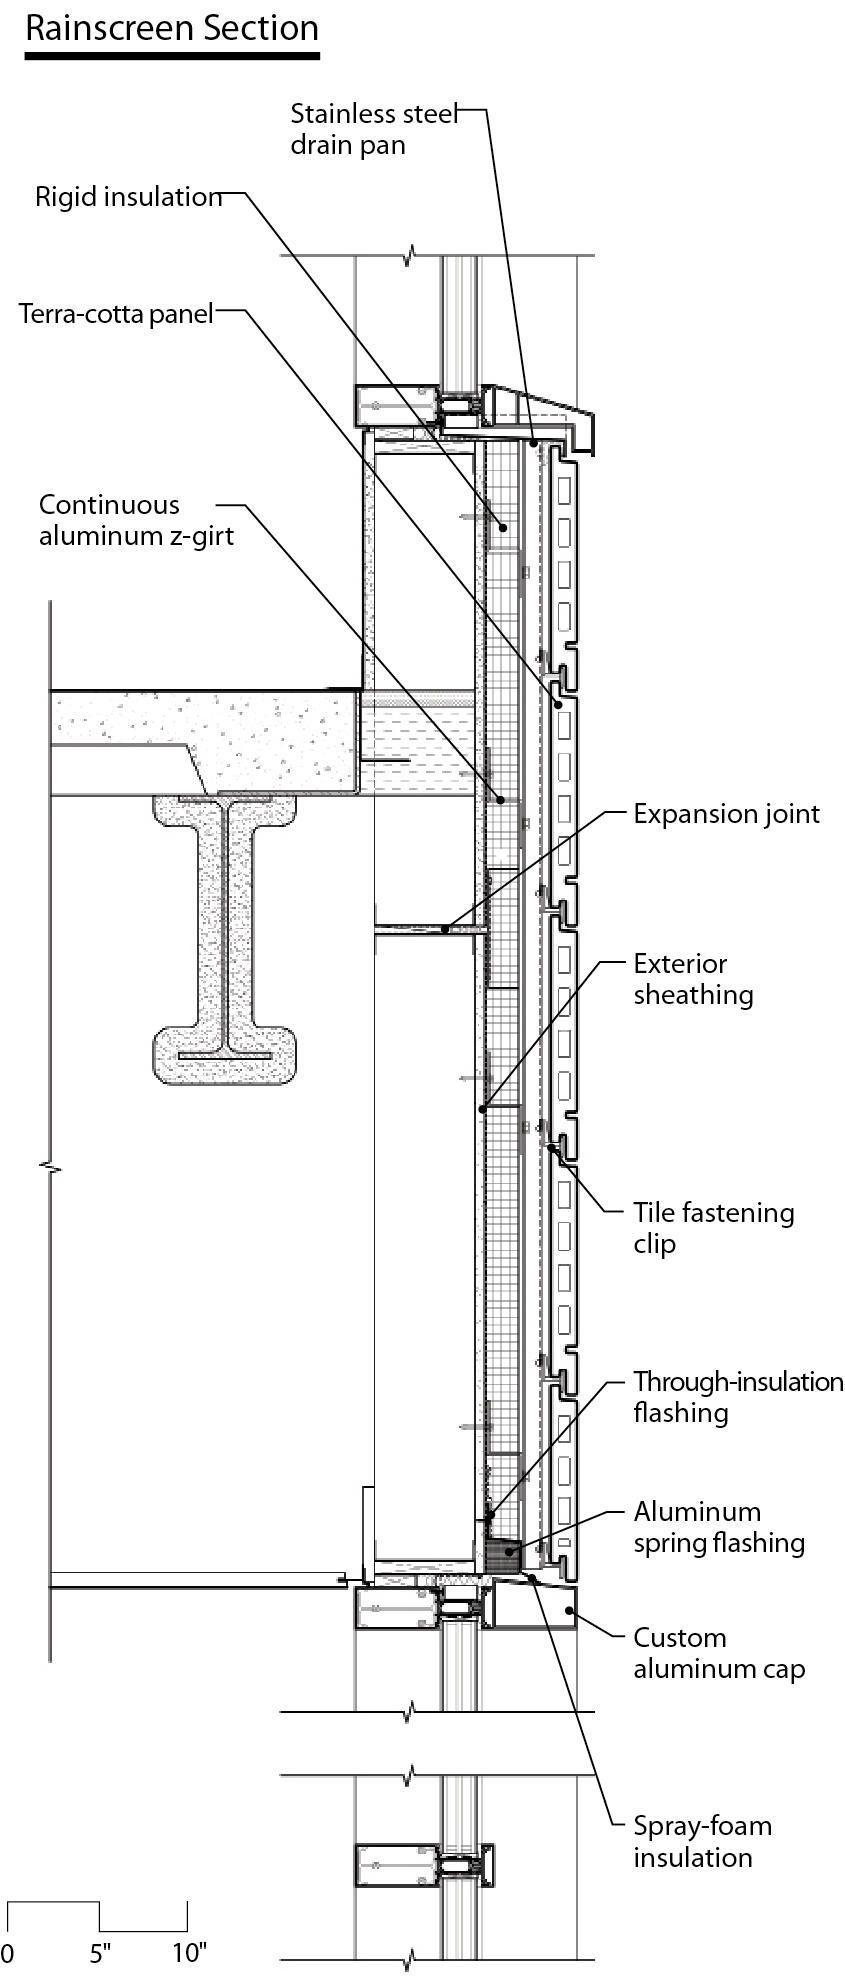 Rainscreen Section Meditech Building Payette